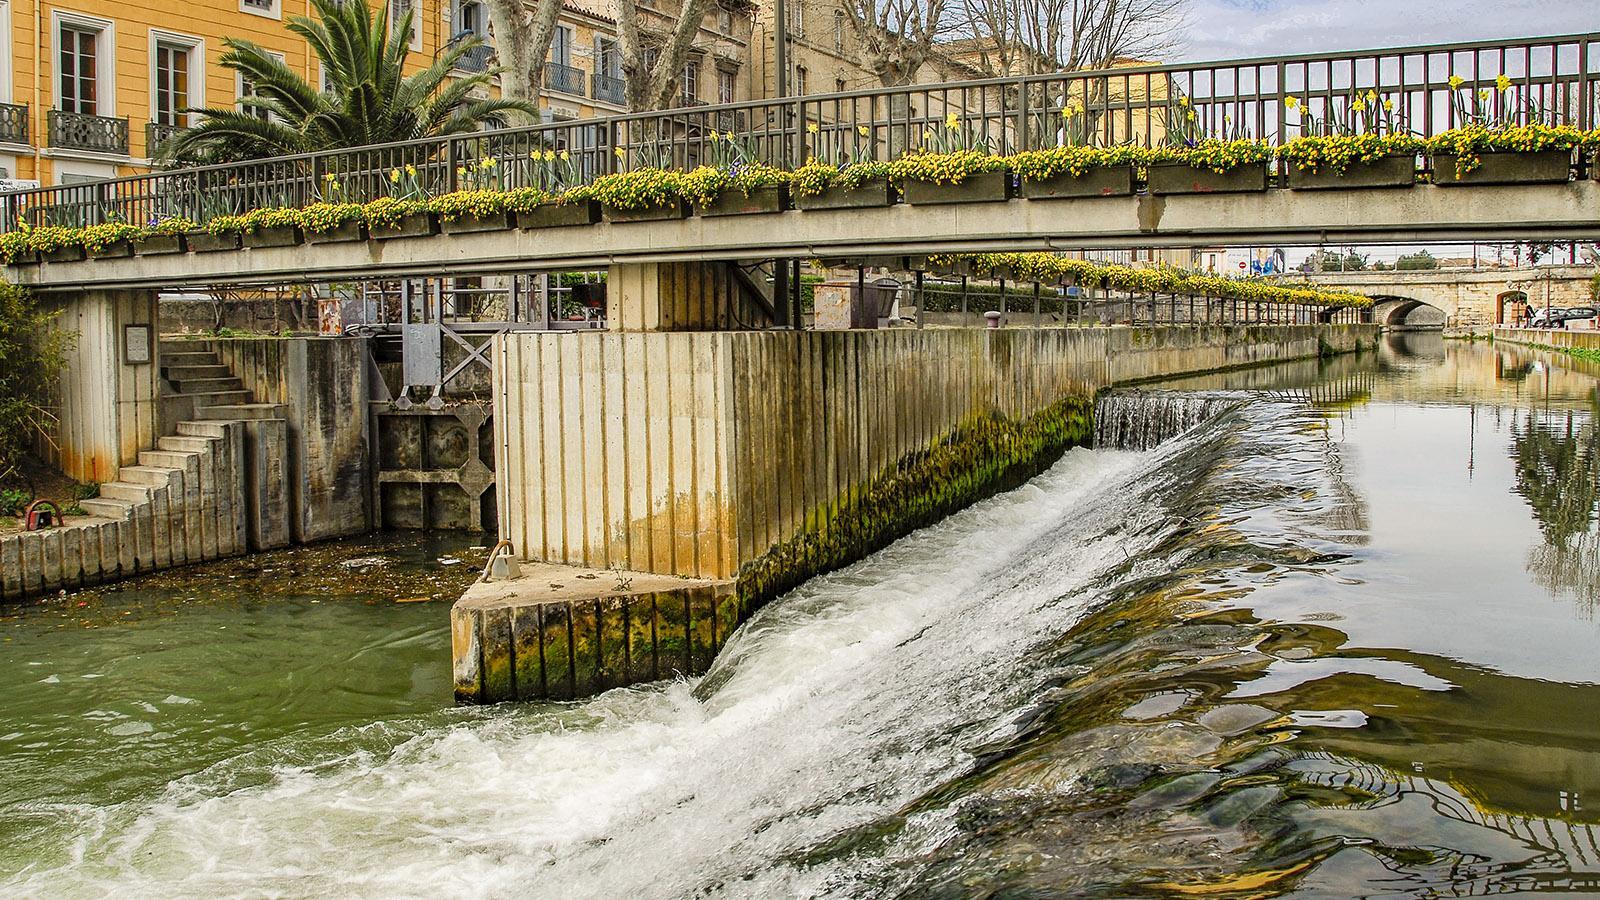 Narbonne: BLulmenschmuck am Canal de la Robine. Foto: Hilke Maunder